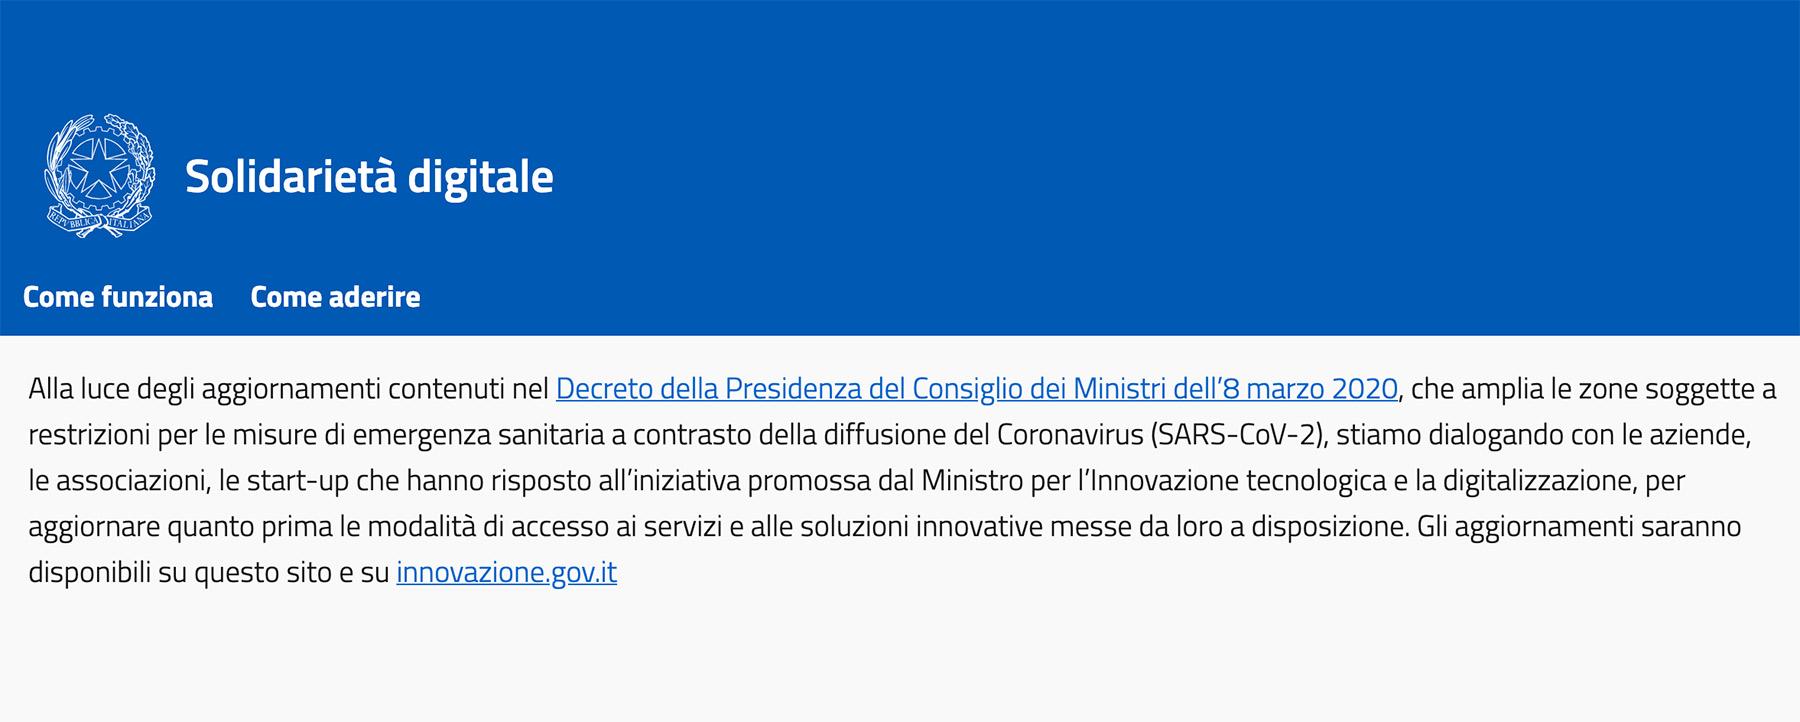 Coronavirus: Servizi Digitali Gratis per i residenti nelle Zone Rosse